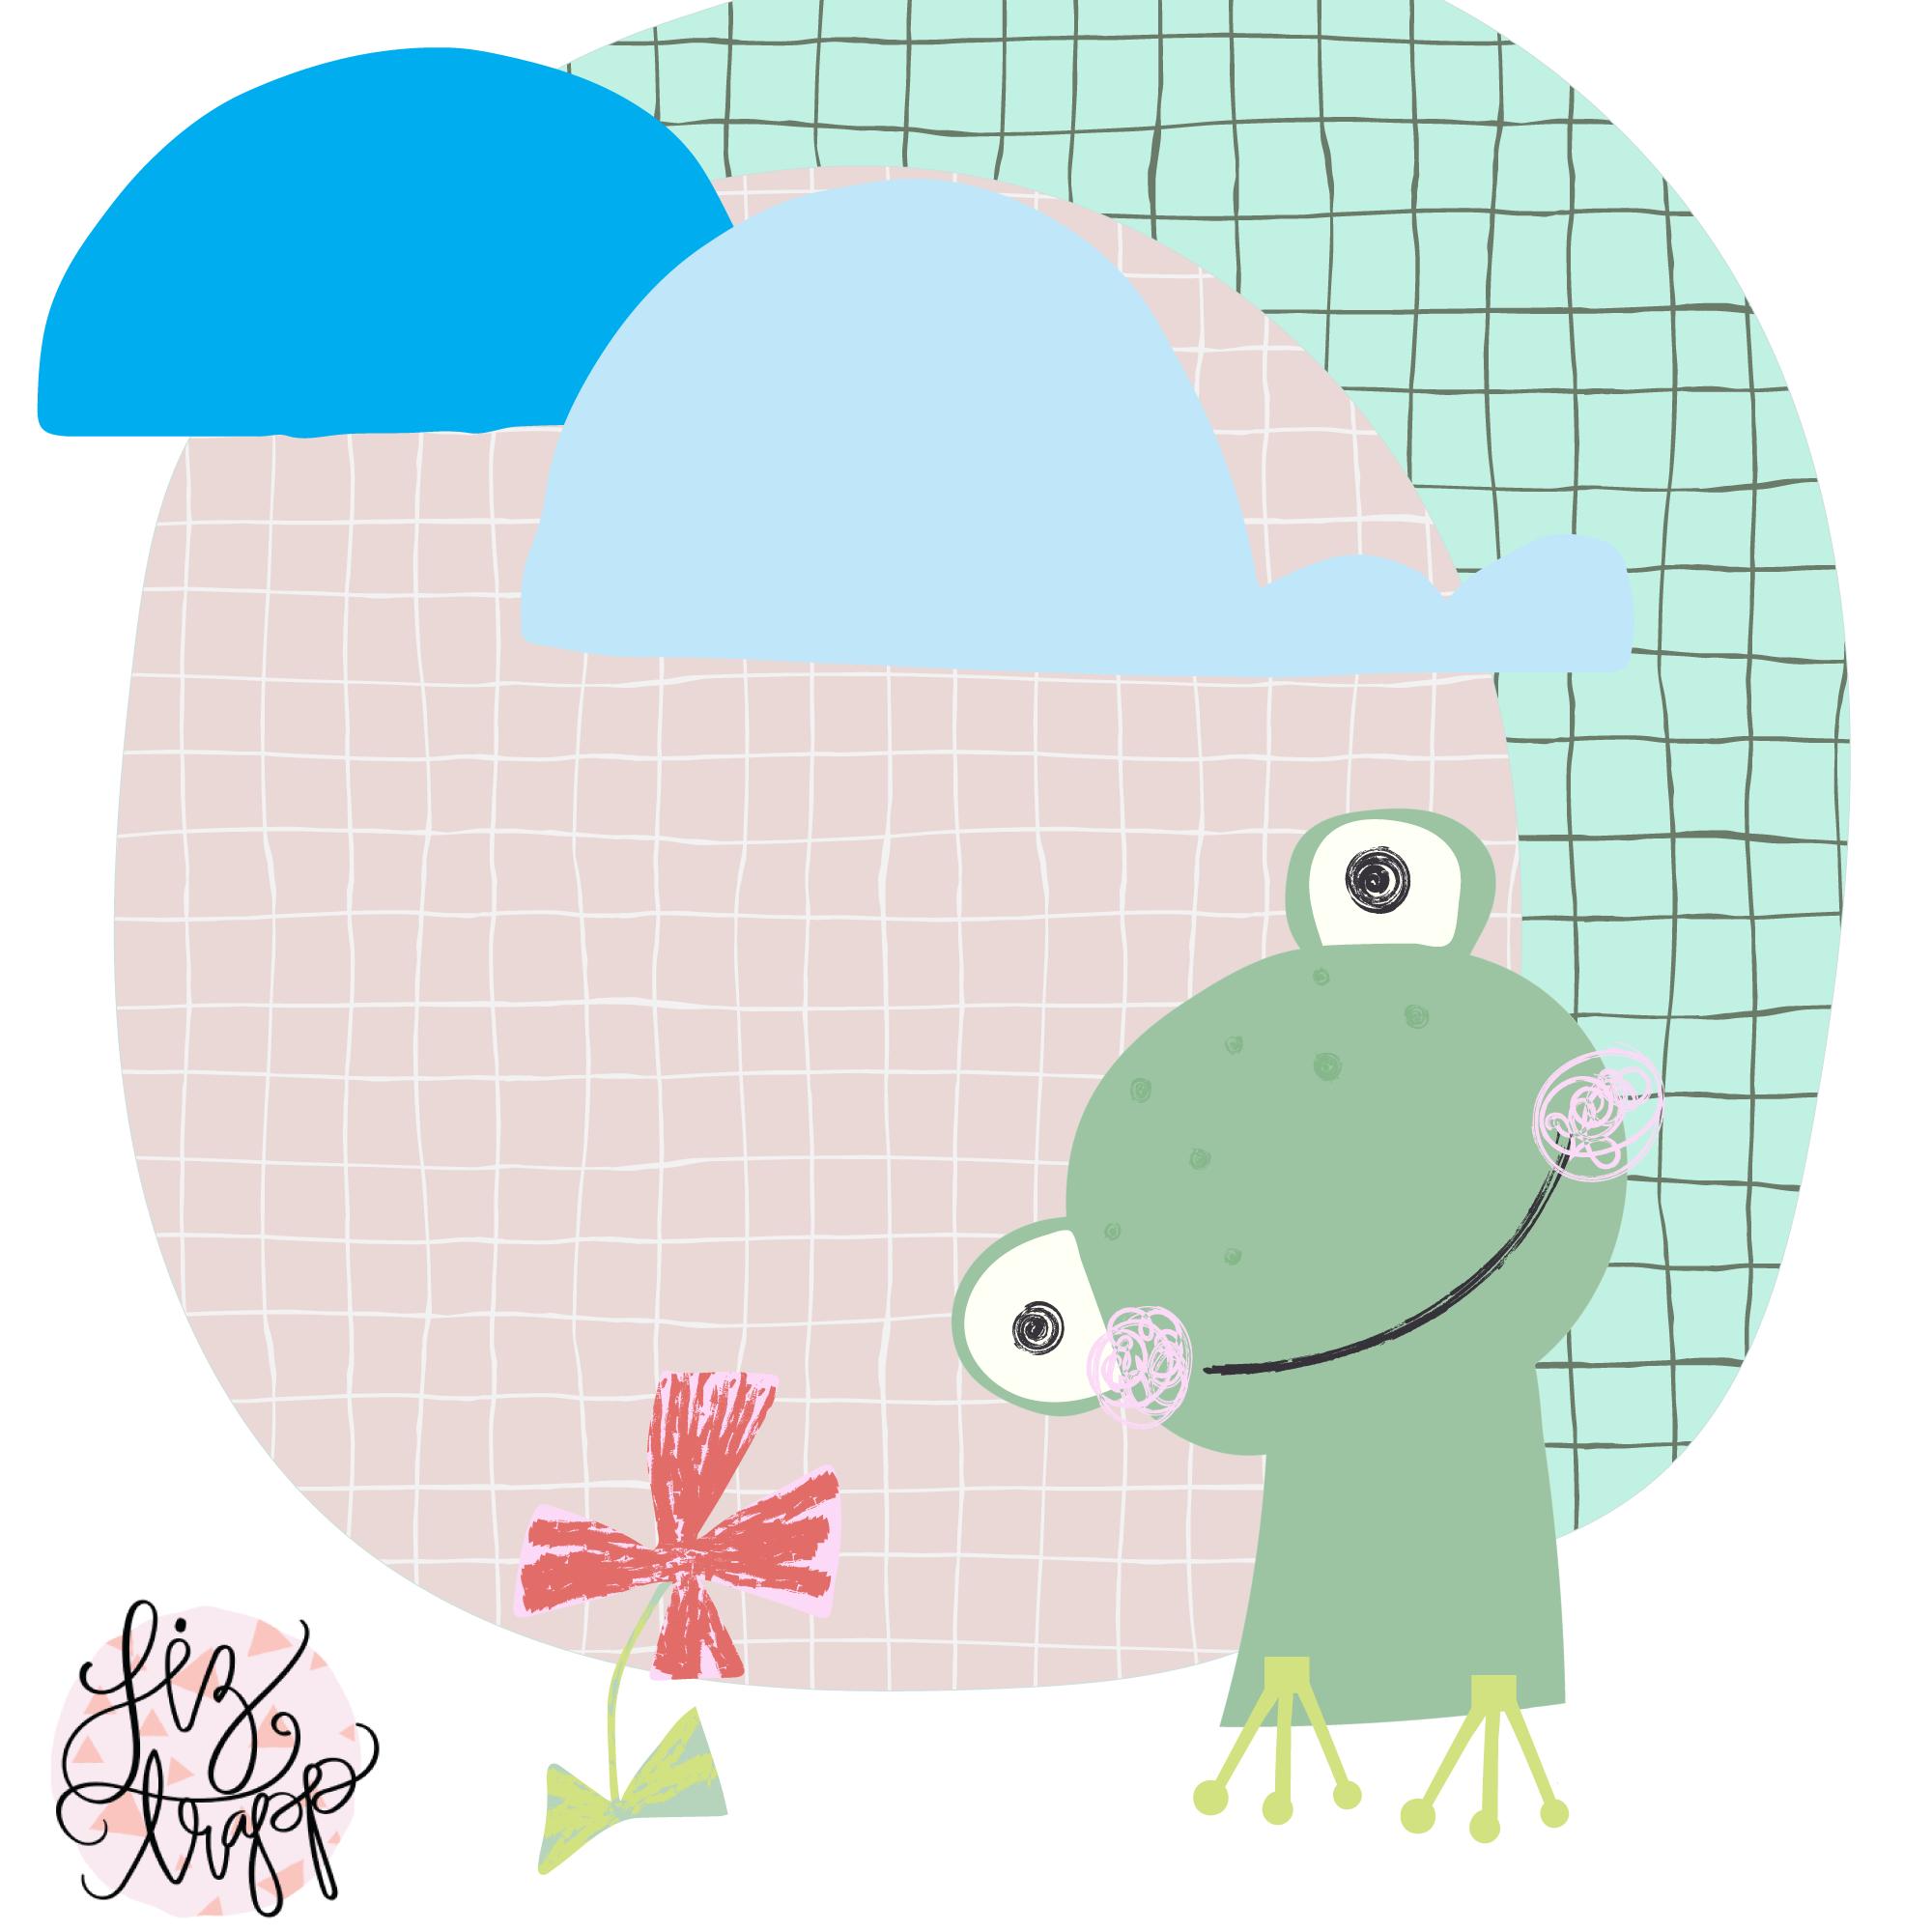 kids-summer-frog-spot-graphic-scene.png